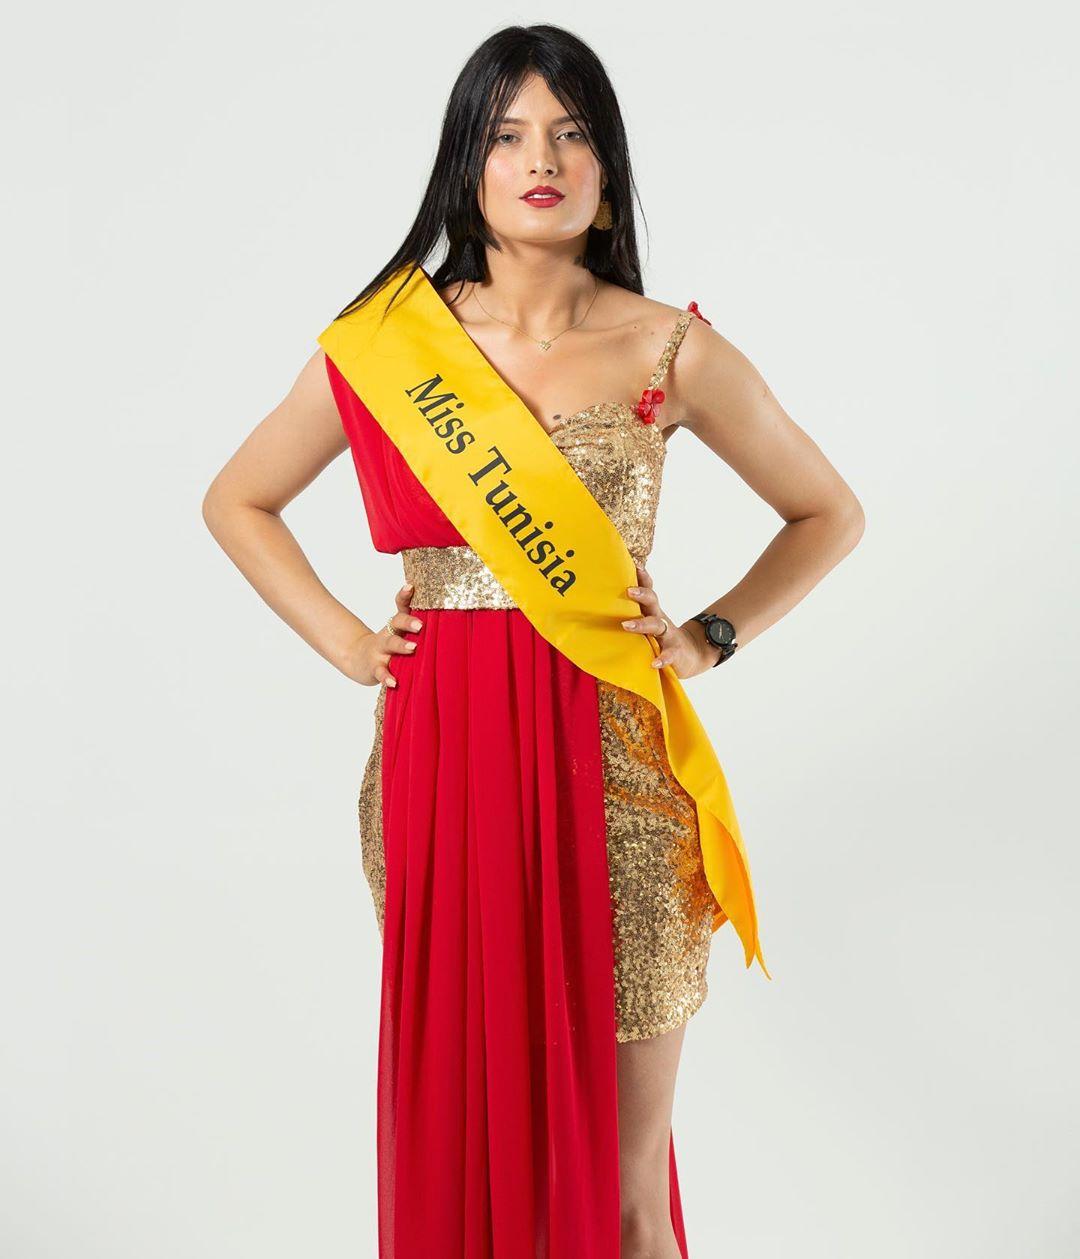 miss latvia vence miss great 2019. 1kOMWc